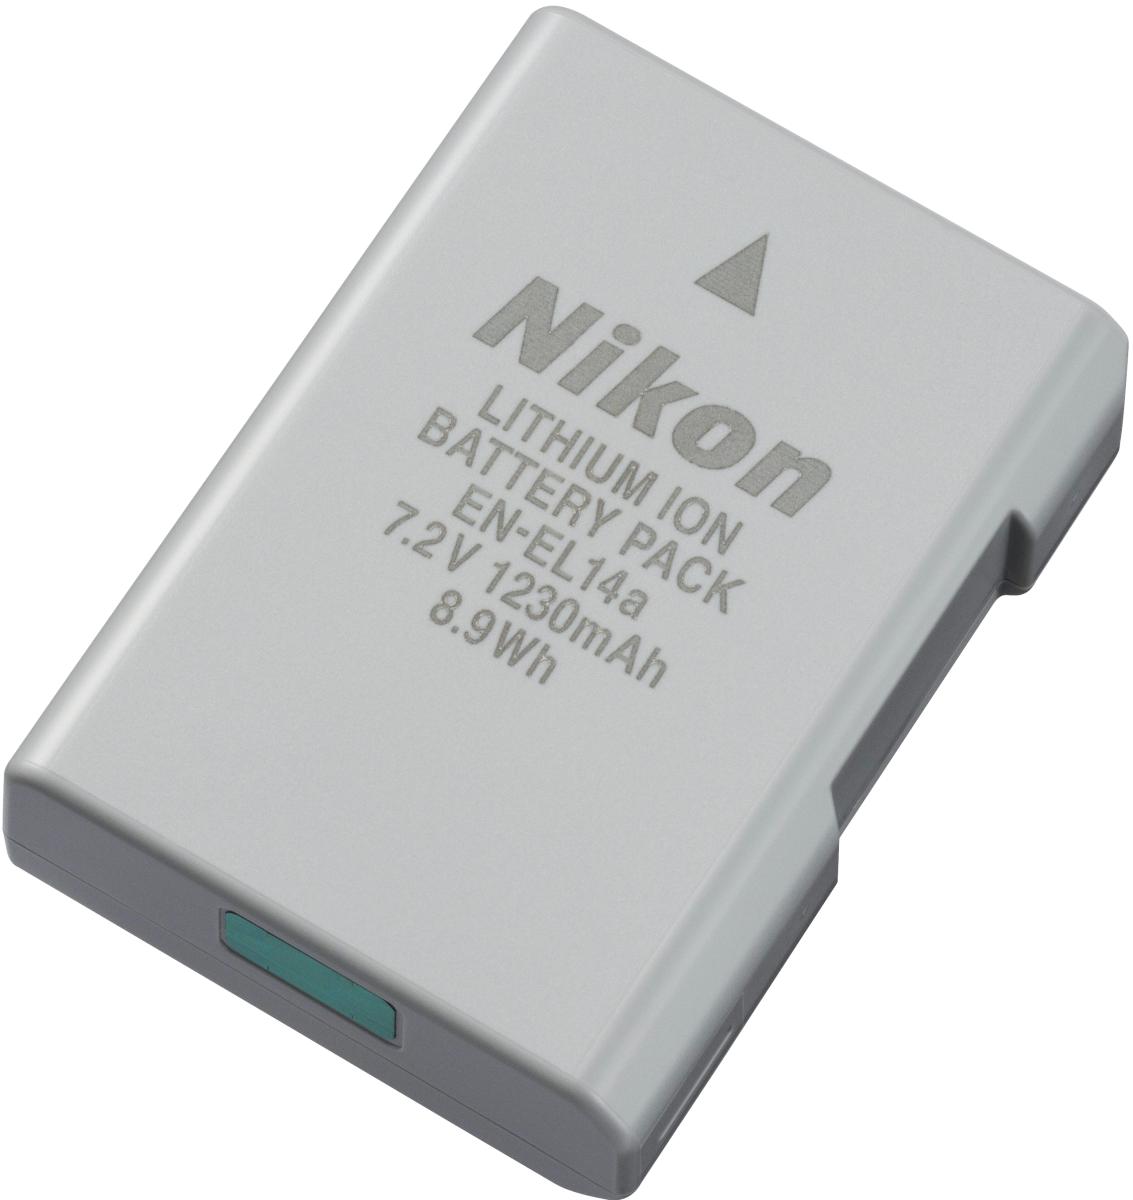 Аккумулятор Nikon EN-EL14a (Батарея для фотоаппарата Никон)